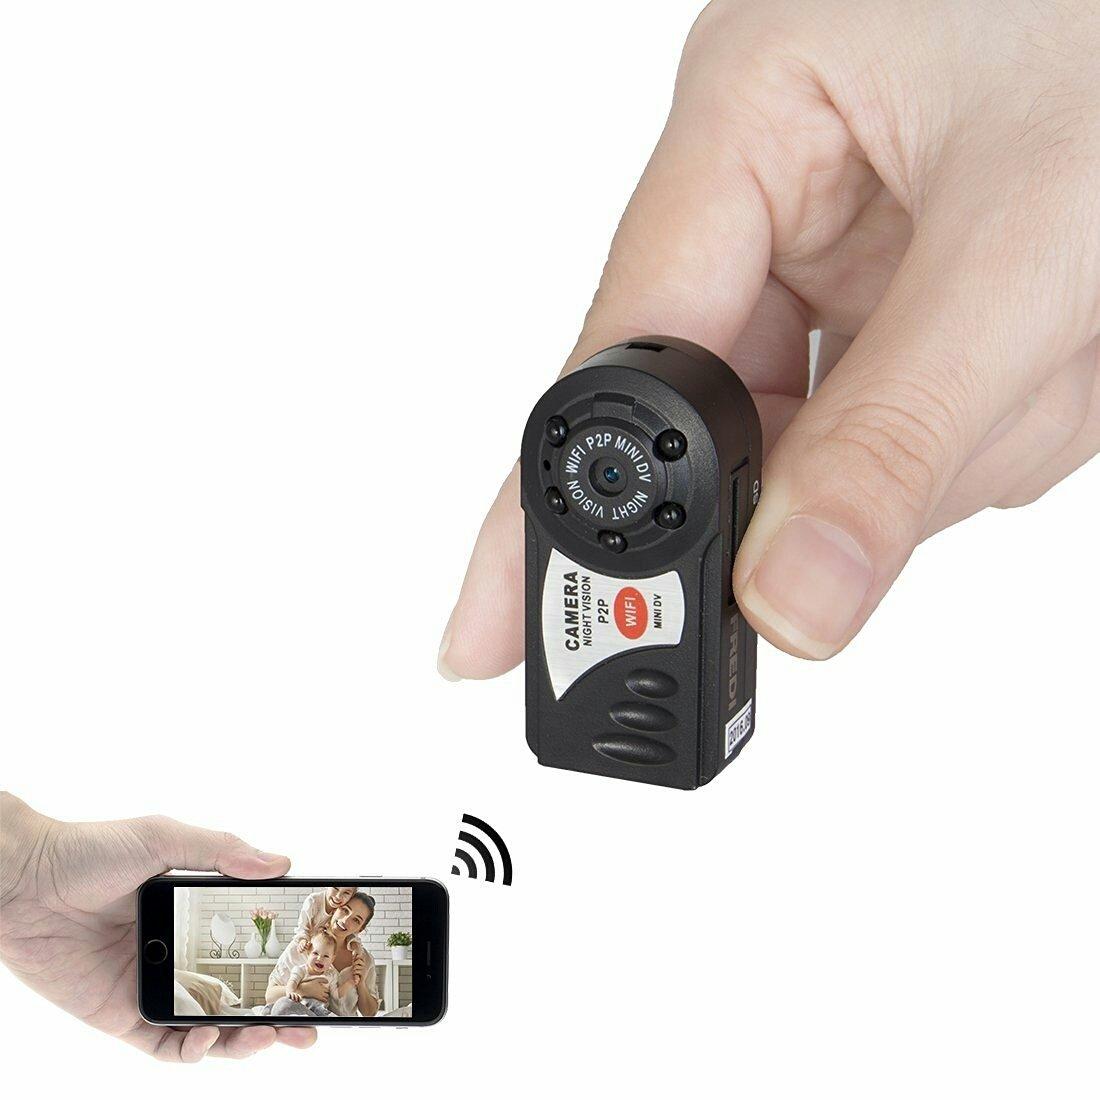 Mini Camera (PAS IP CAMERA) Rechargeable Portatif P2P WiFi Indoor/Outdoor HD DV Camera Espion Video Photo Video Recorder Securite - iPhone/Android Phone/ iPad /PC - VENDU A DES CLIENTS AVISES